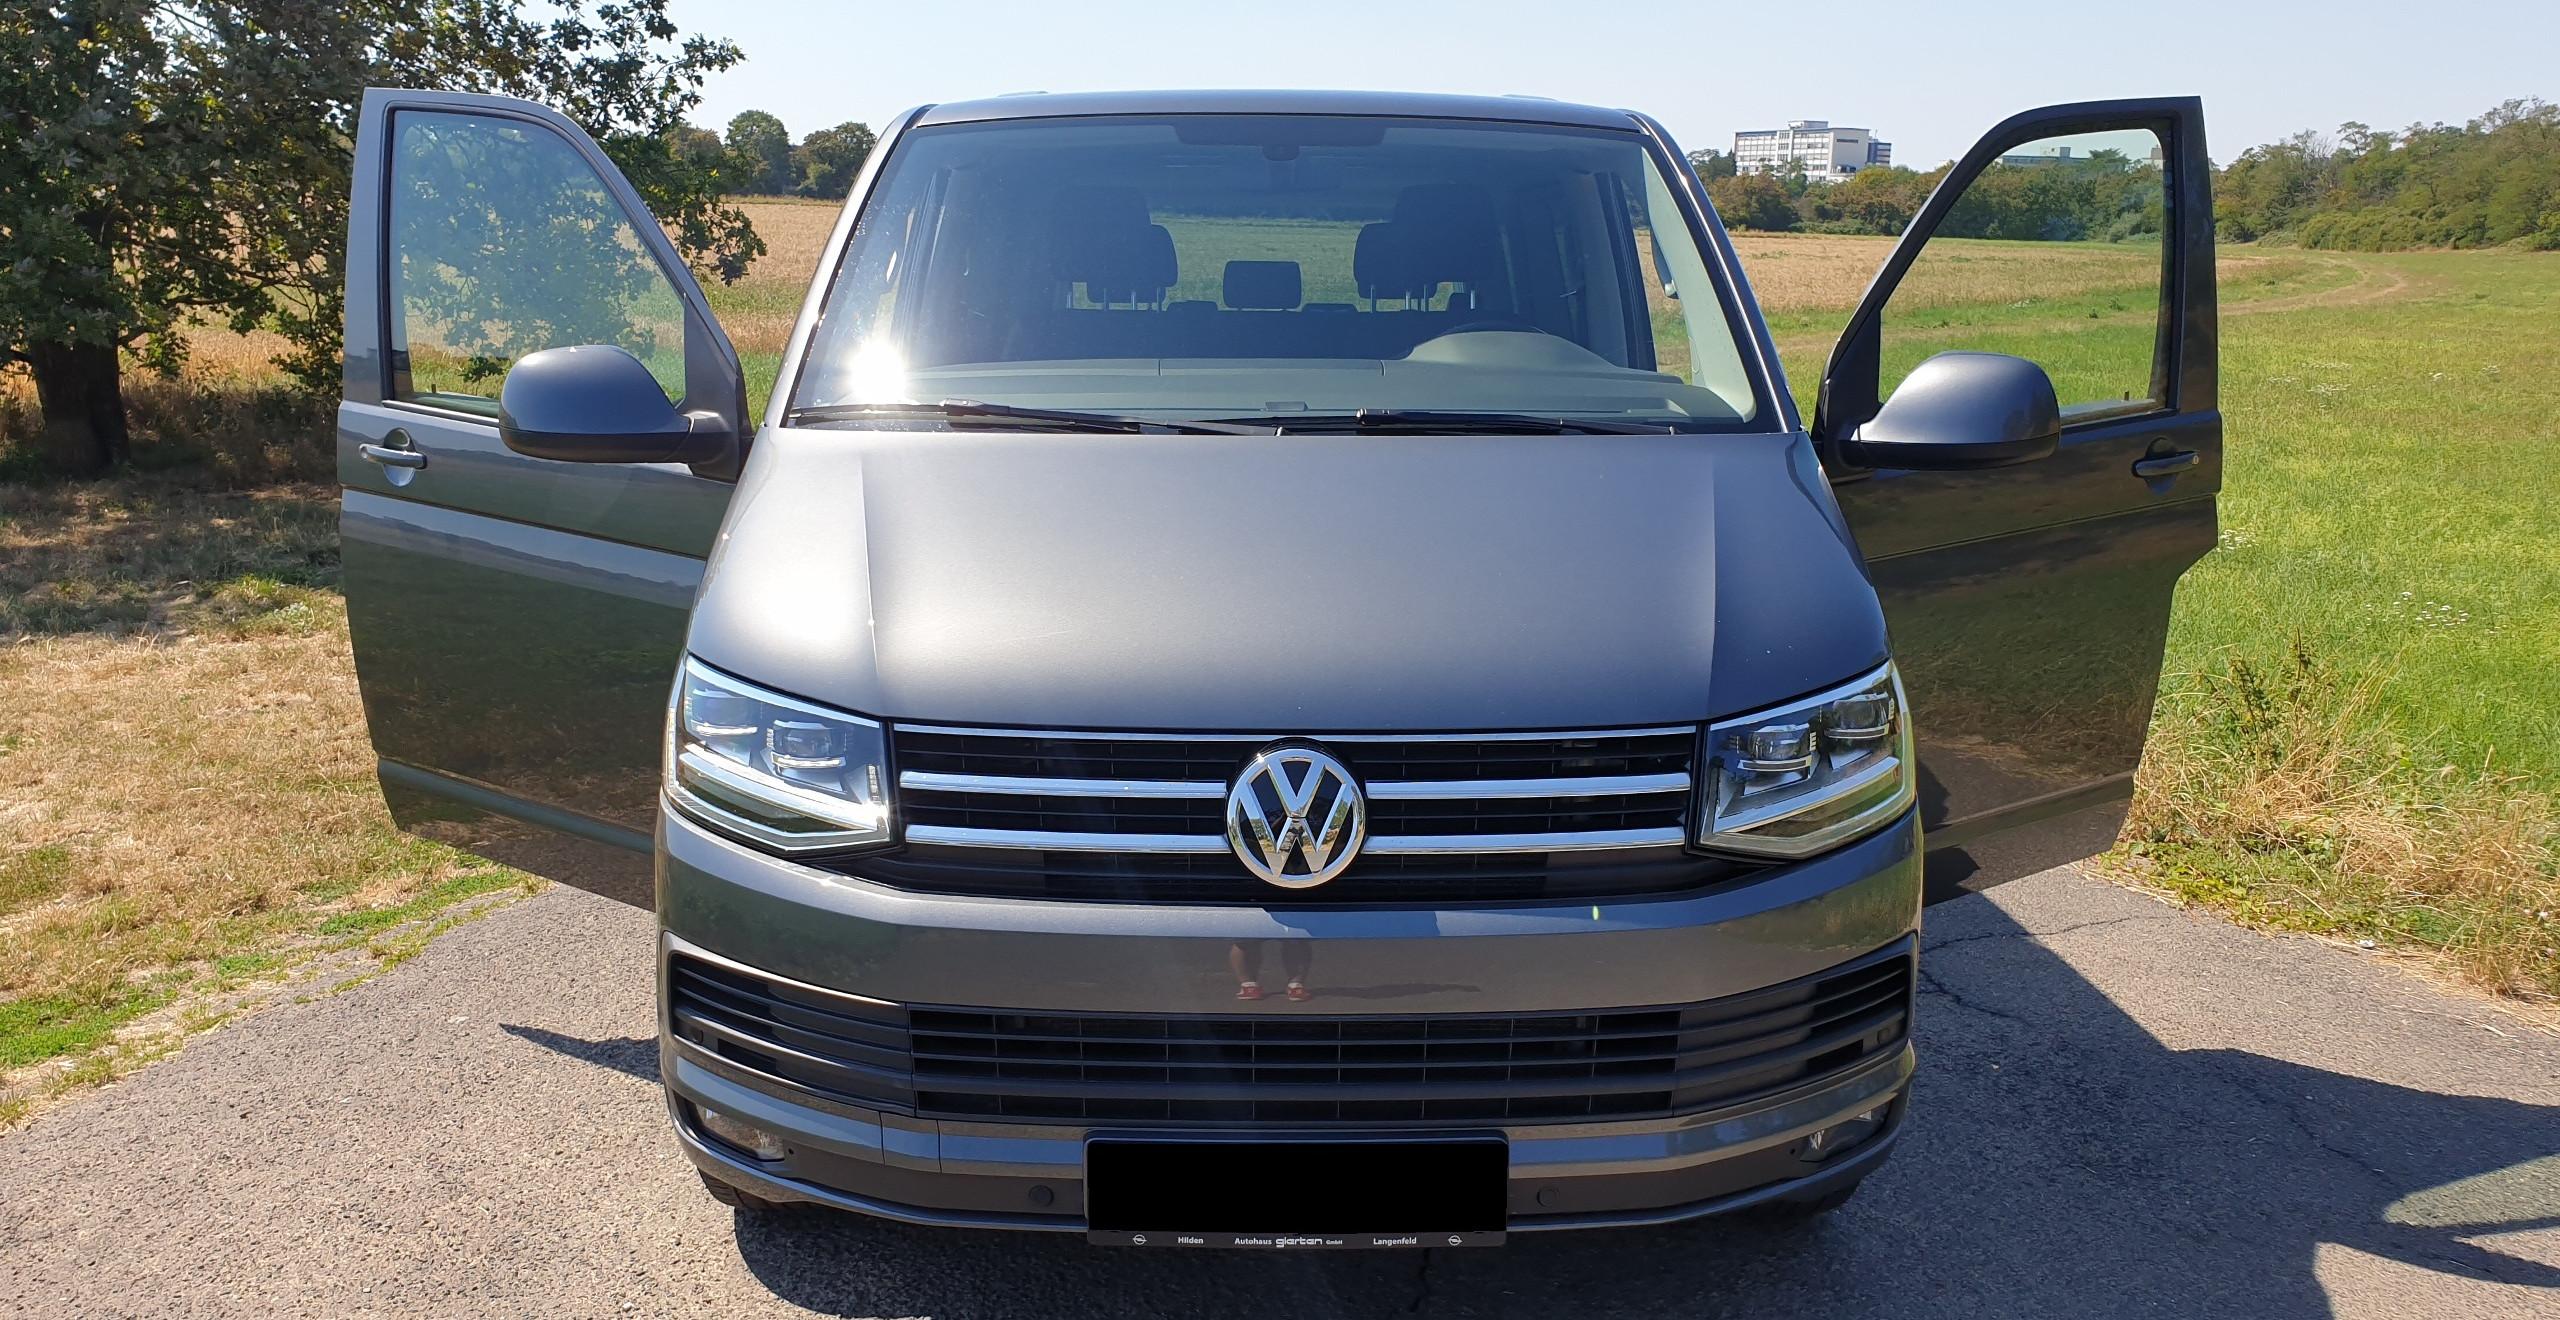 Import Auto Allemagne - Auto Convoi Allemagne - Volkswagen T6 Multivan Confortline 2.0 TDI 150ch